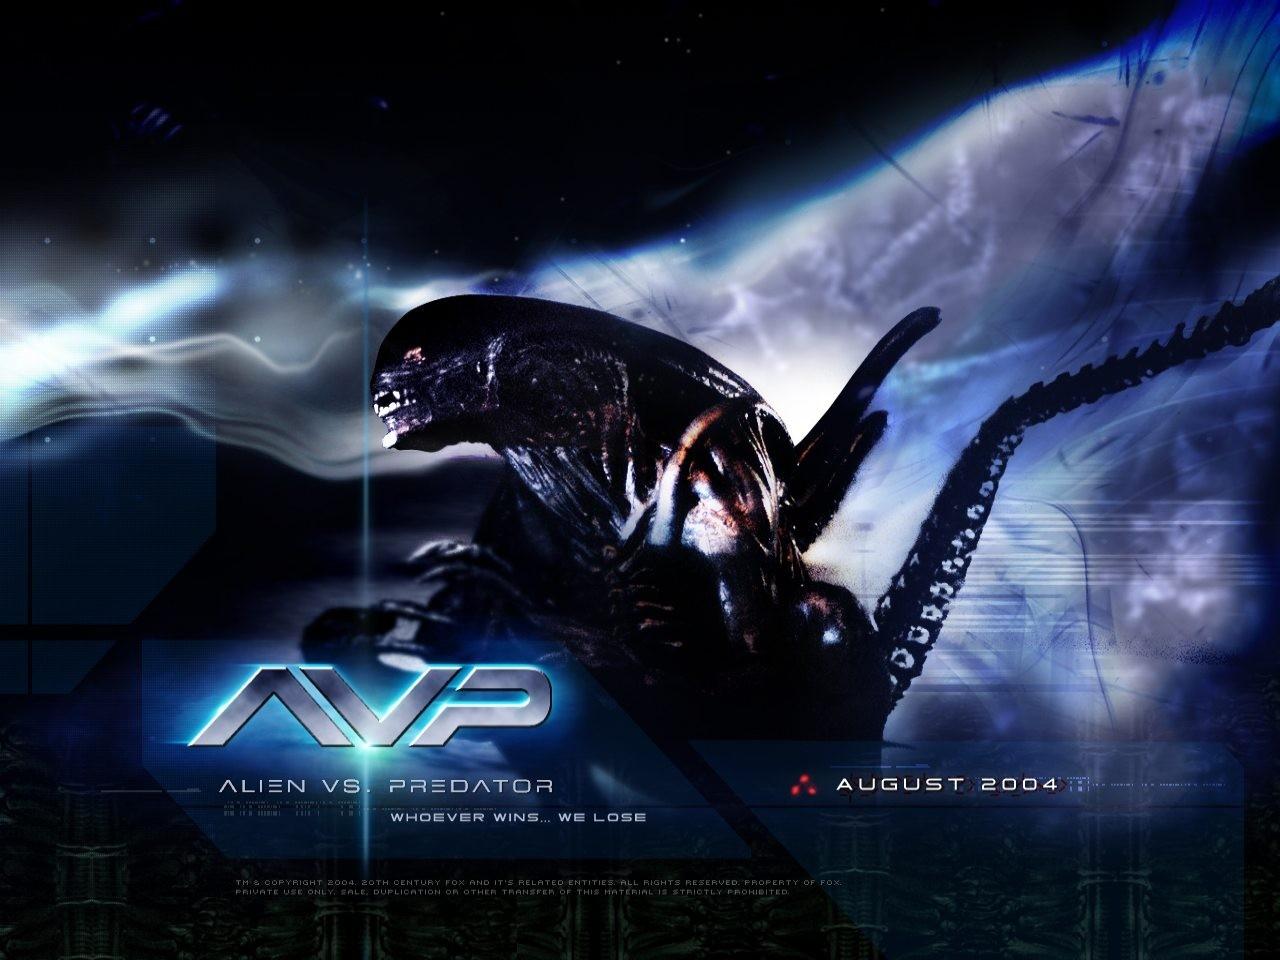 Un wallpaper del film Alien Vs. Predator